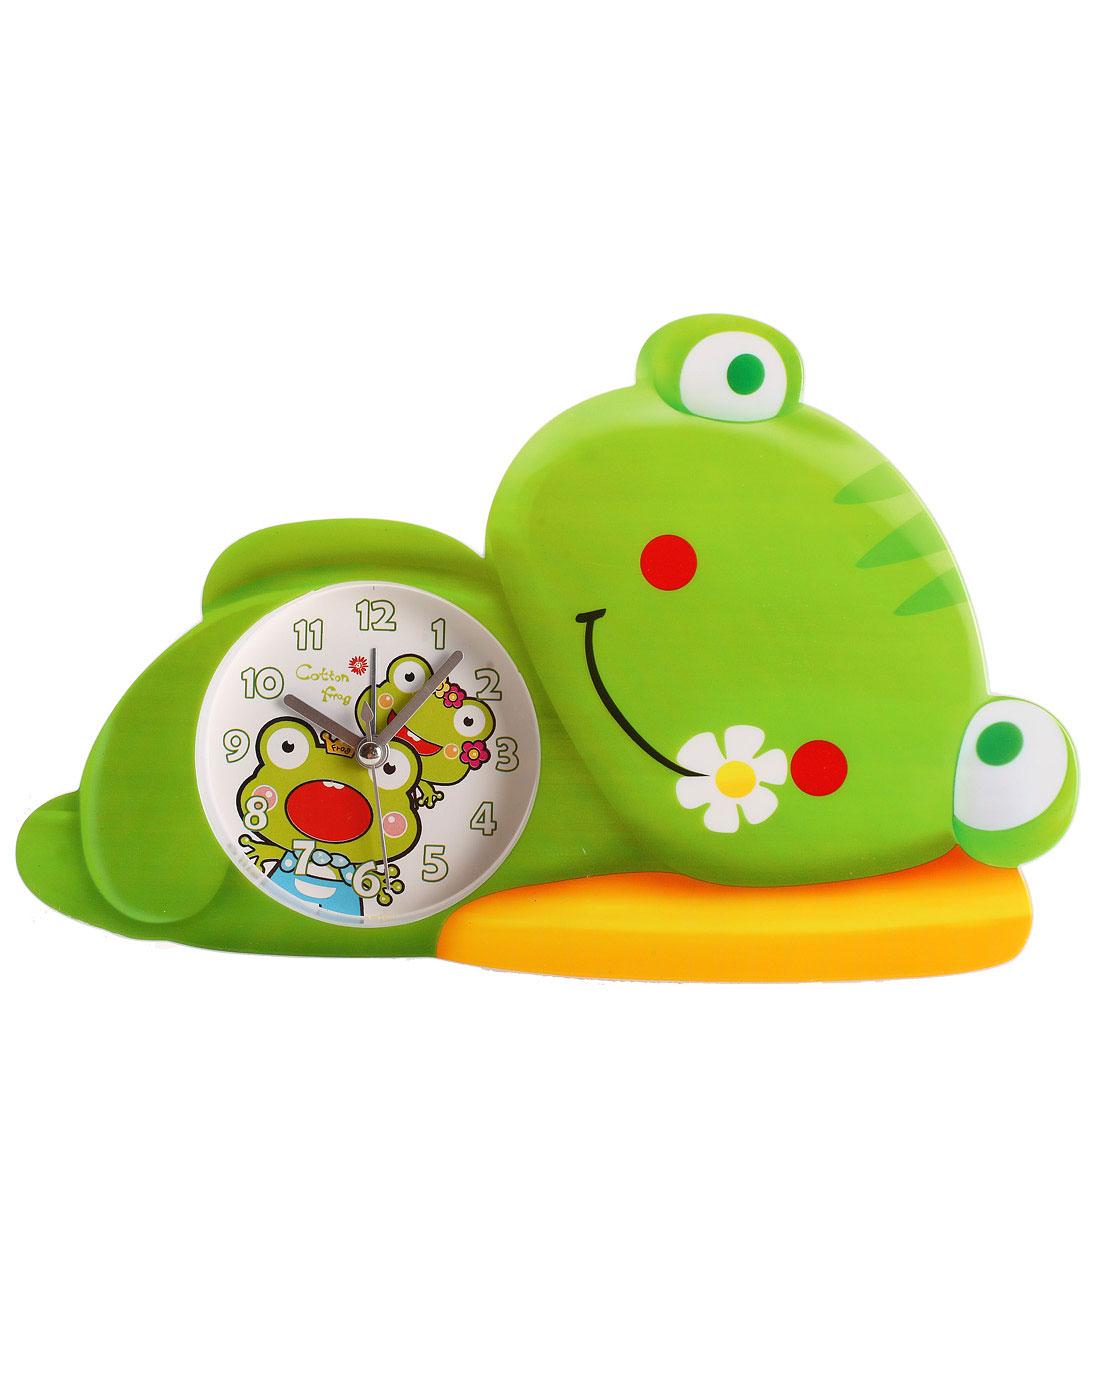 h&3家居用品专场绿色可爱睡眠青蛙卡通闹钟